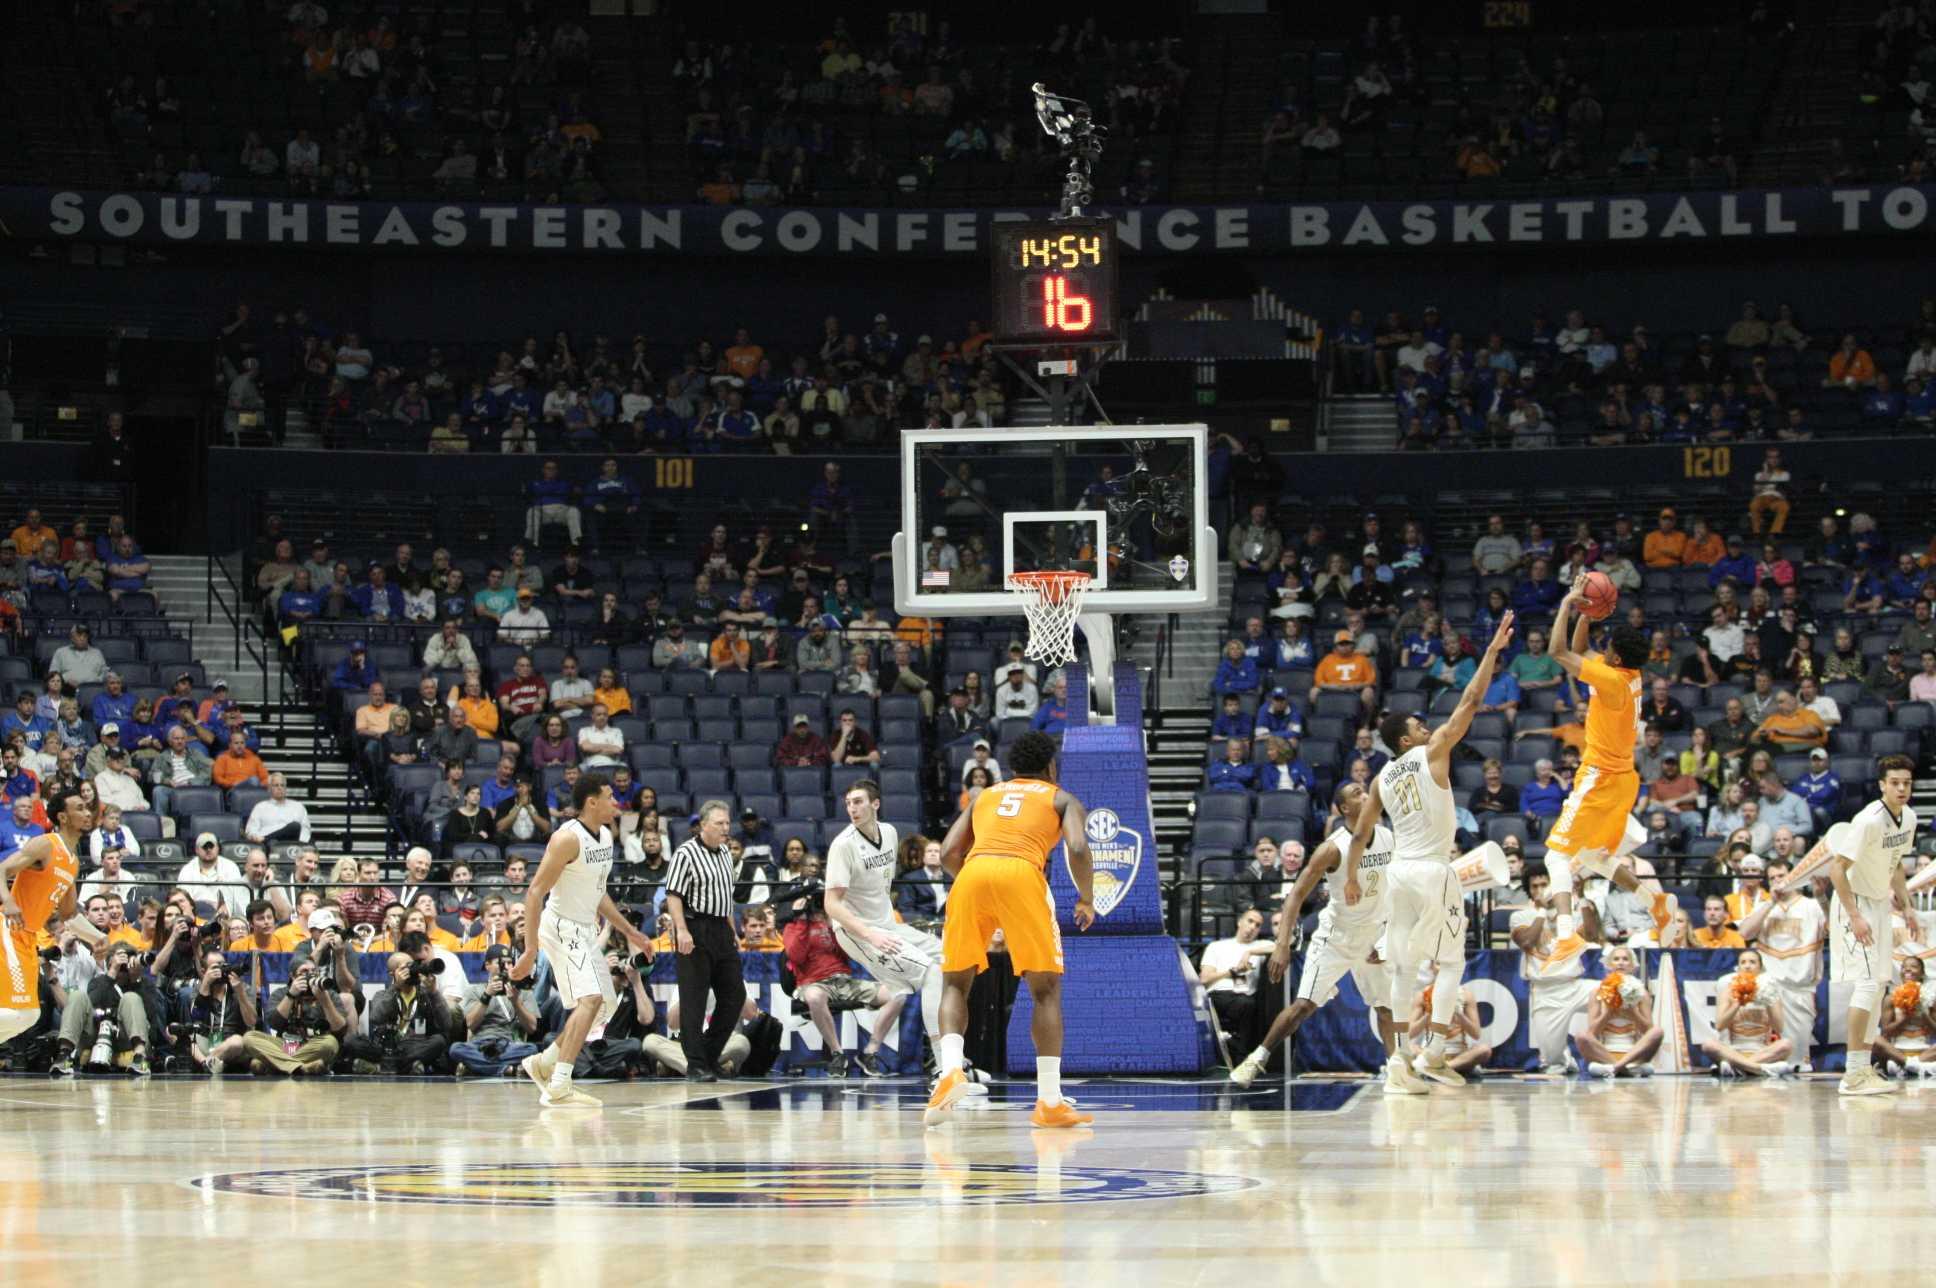 Vanderbilt lost to Tennessee 67-65 in a heartbreaker in the Second Round of the 2016 SEC Tournament at Bridgestone Arena Nashville, TN. Photo by Ziyi Liu.